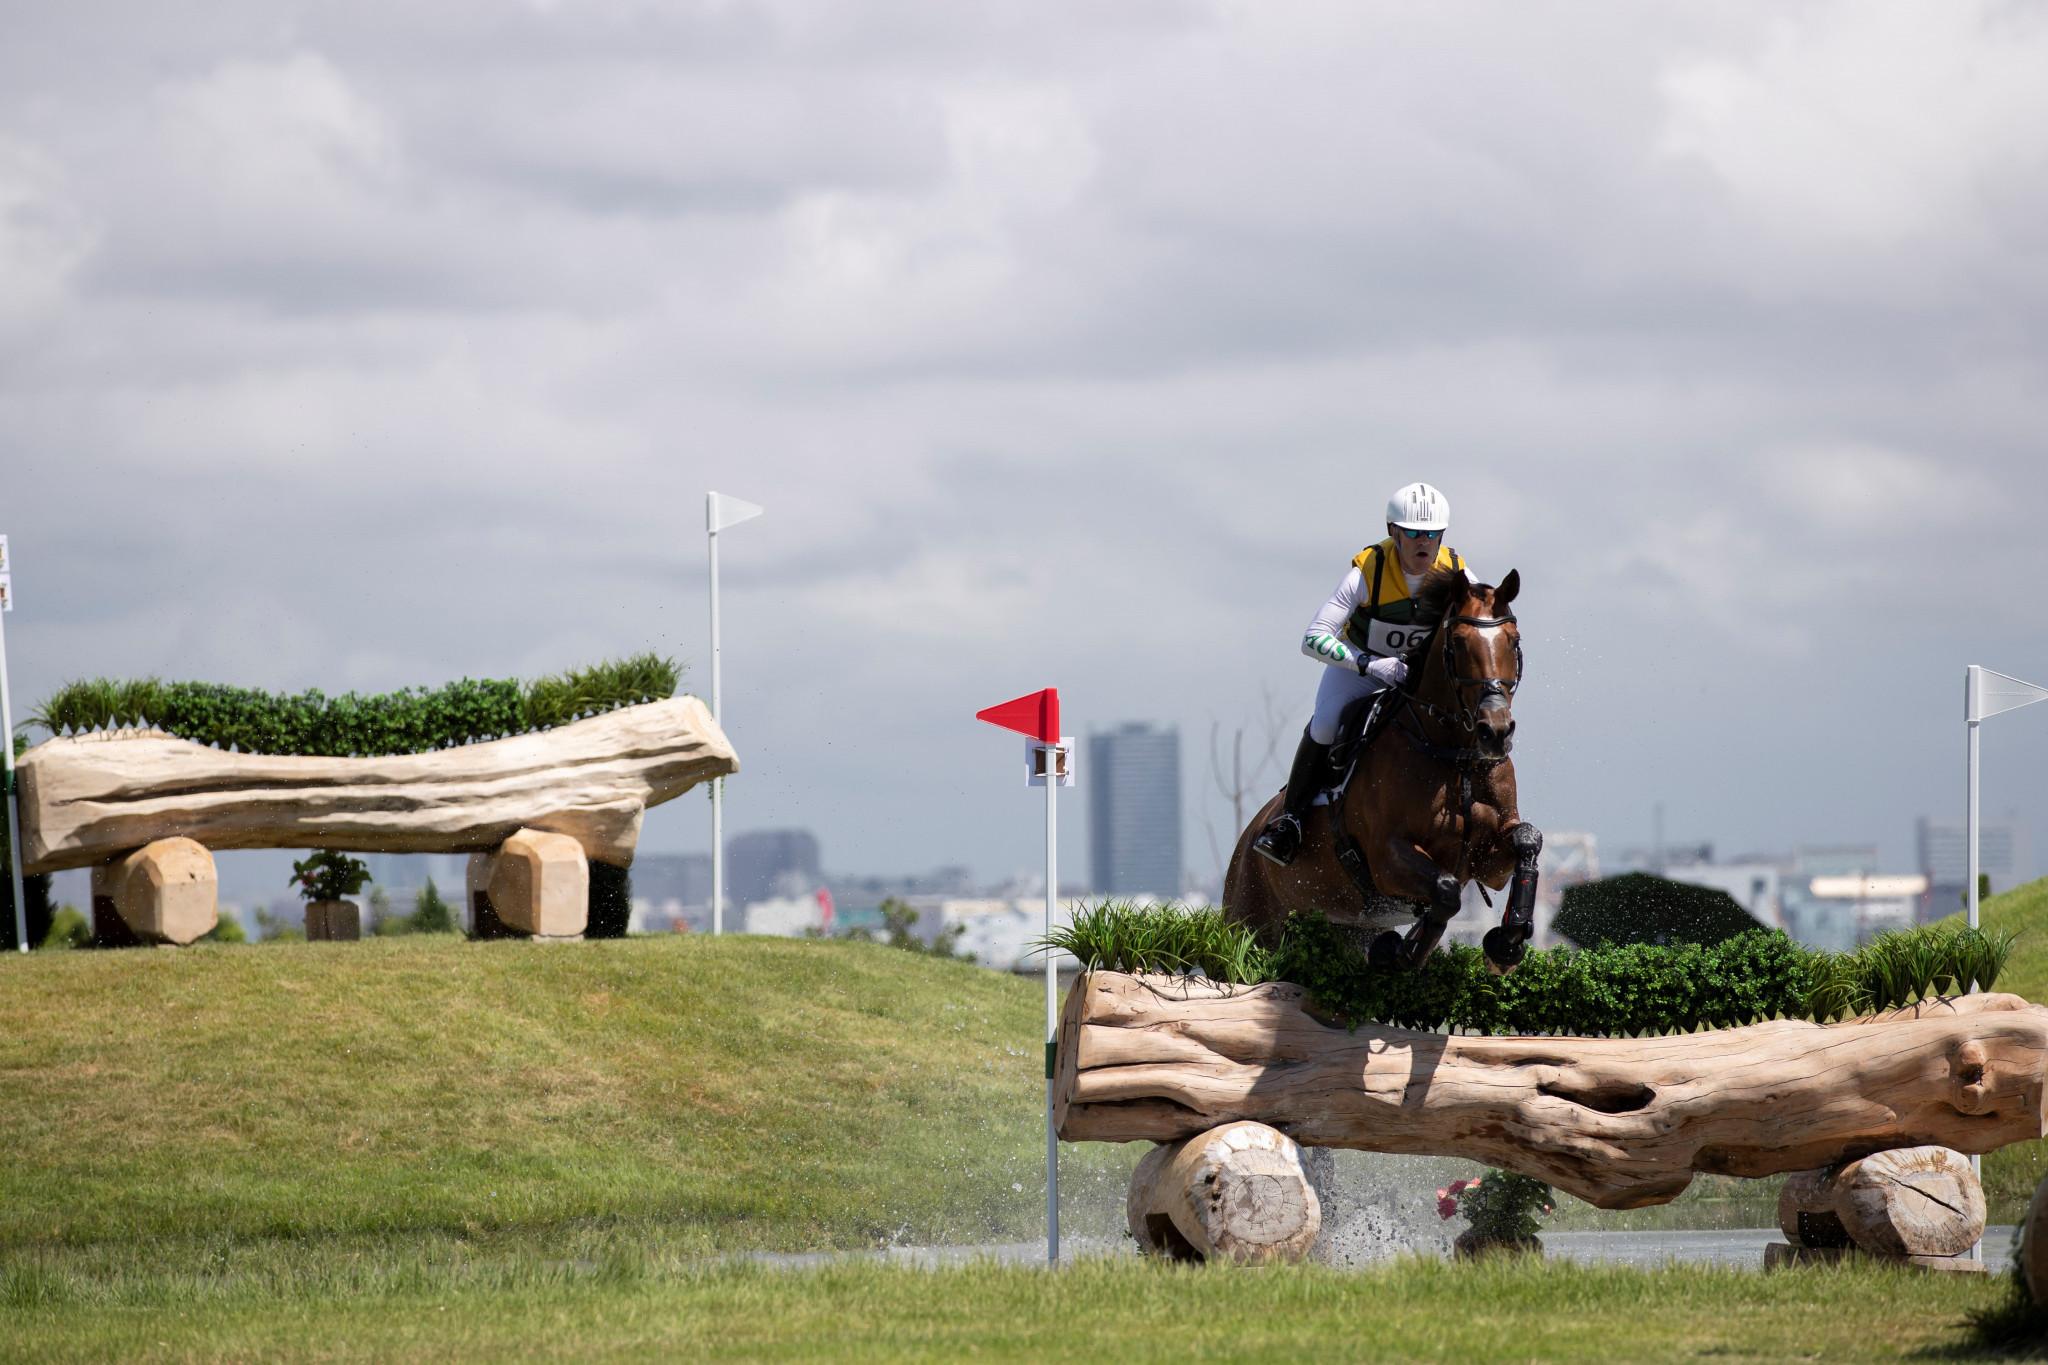 Australian Andrew Hoy has taken the lead at eventing Tokyo 2020 test event ©FEI/Yusuke Nakanishi